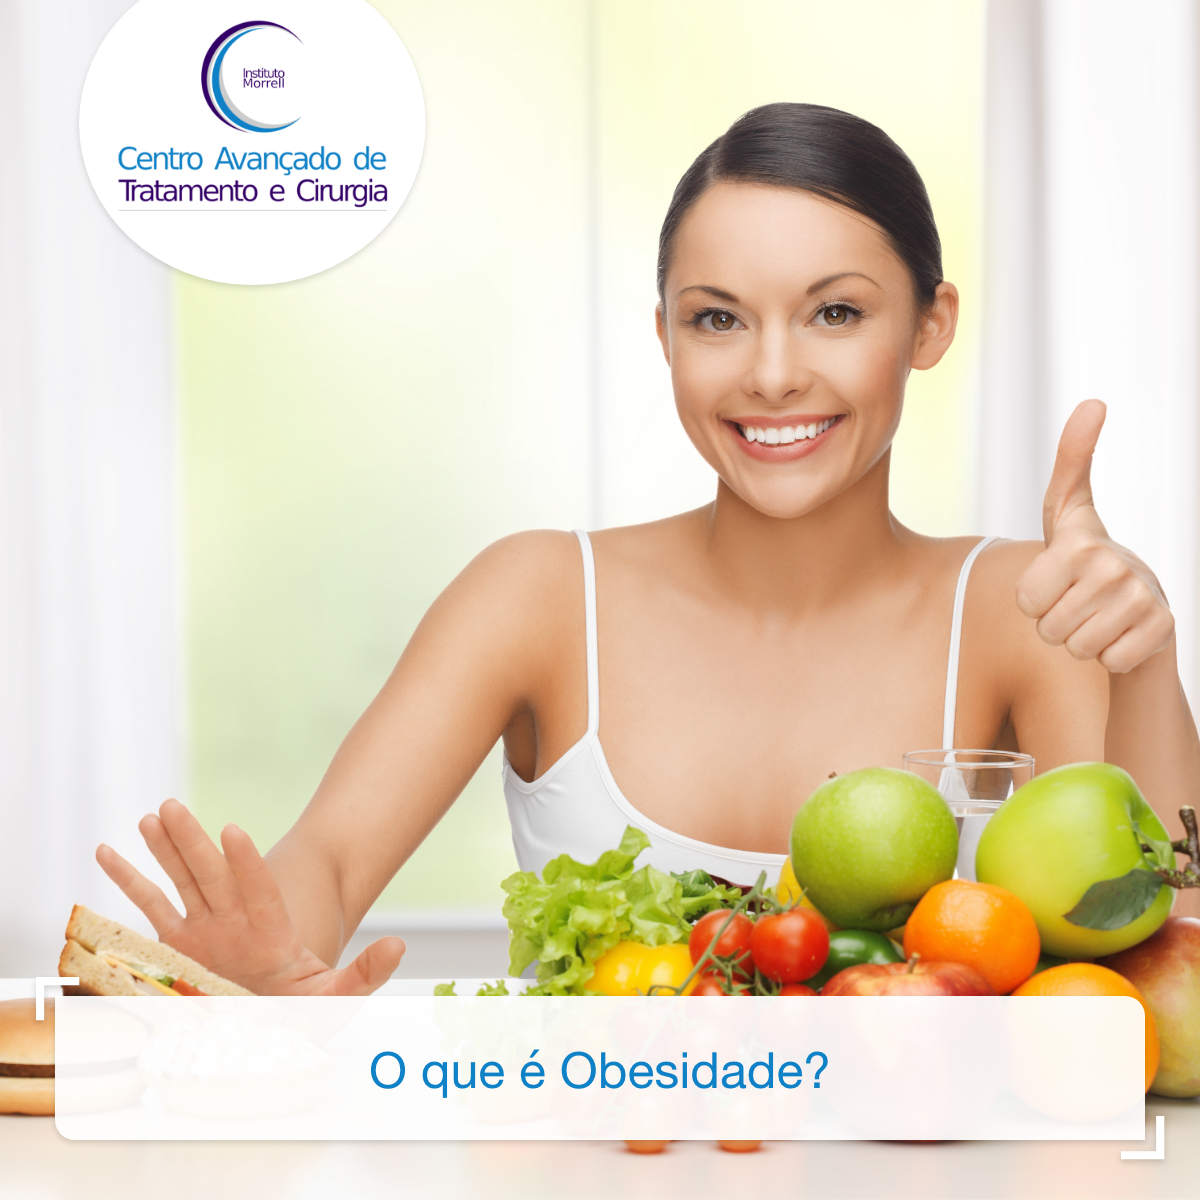 MORREL-2018-O_que_é_Obesidade-1200x1200.png